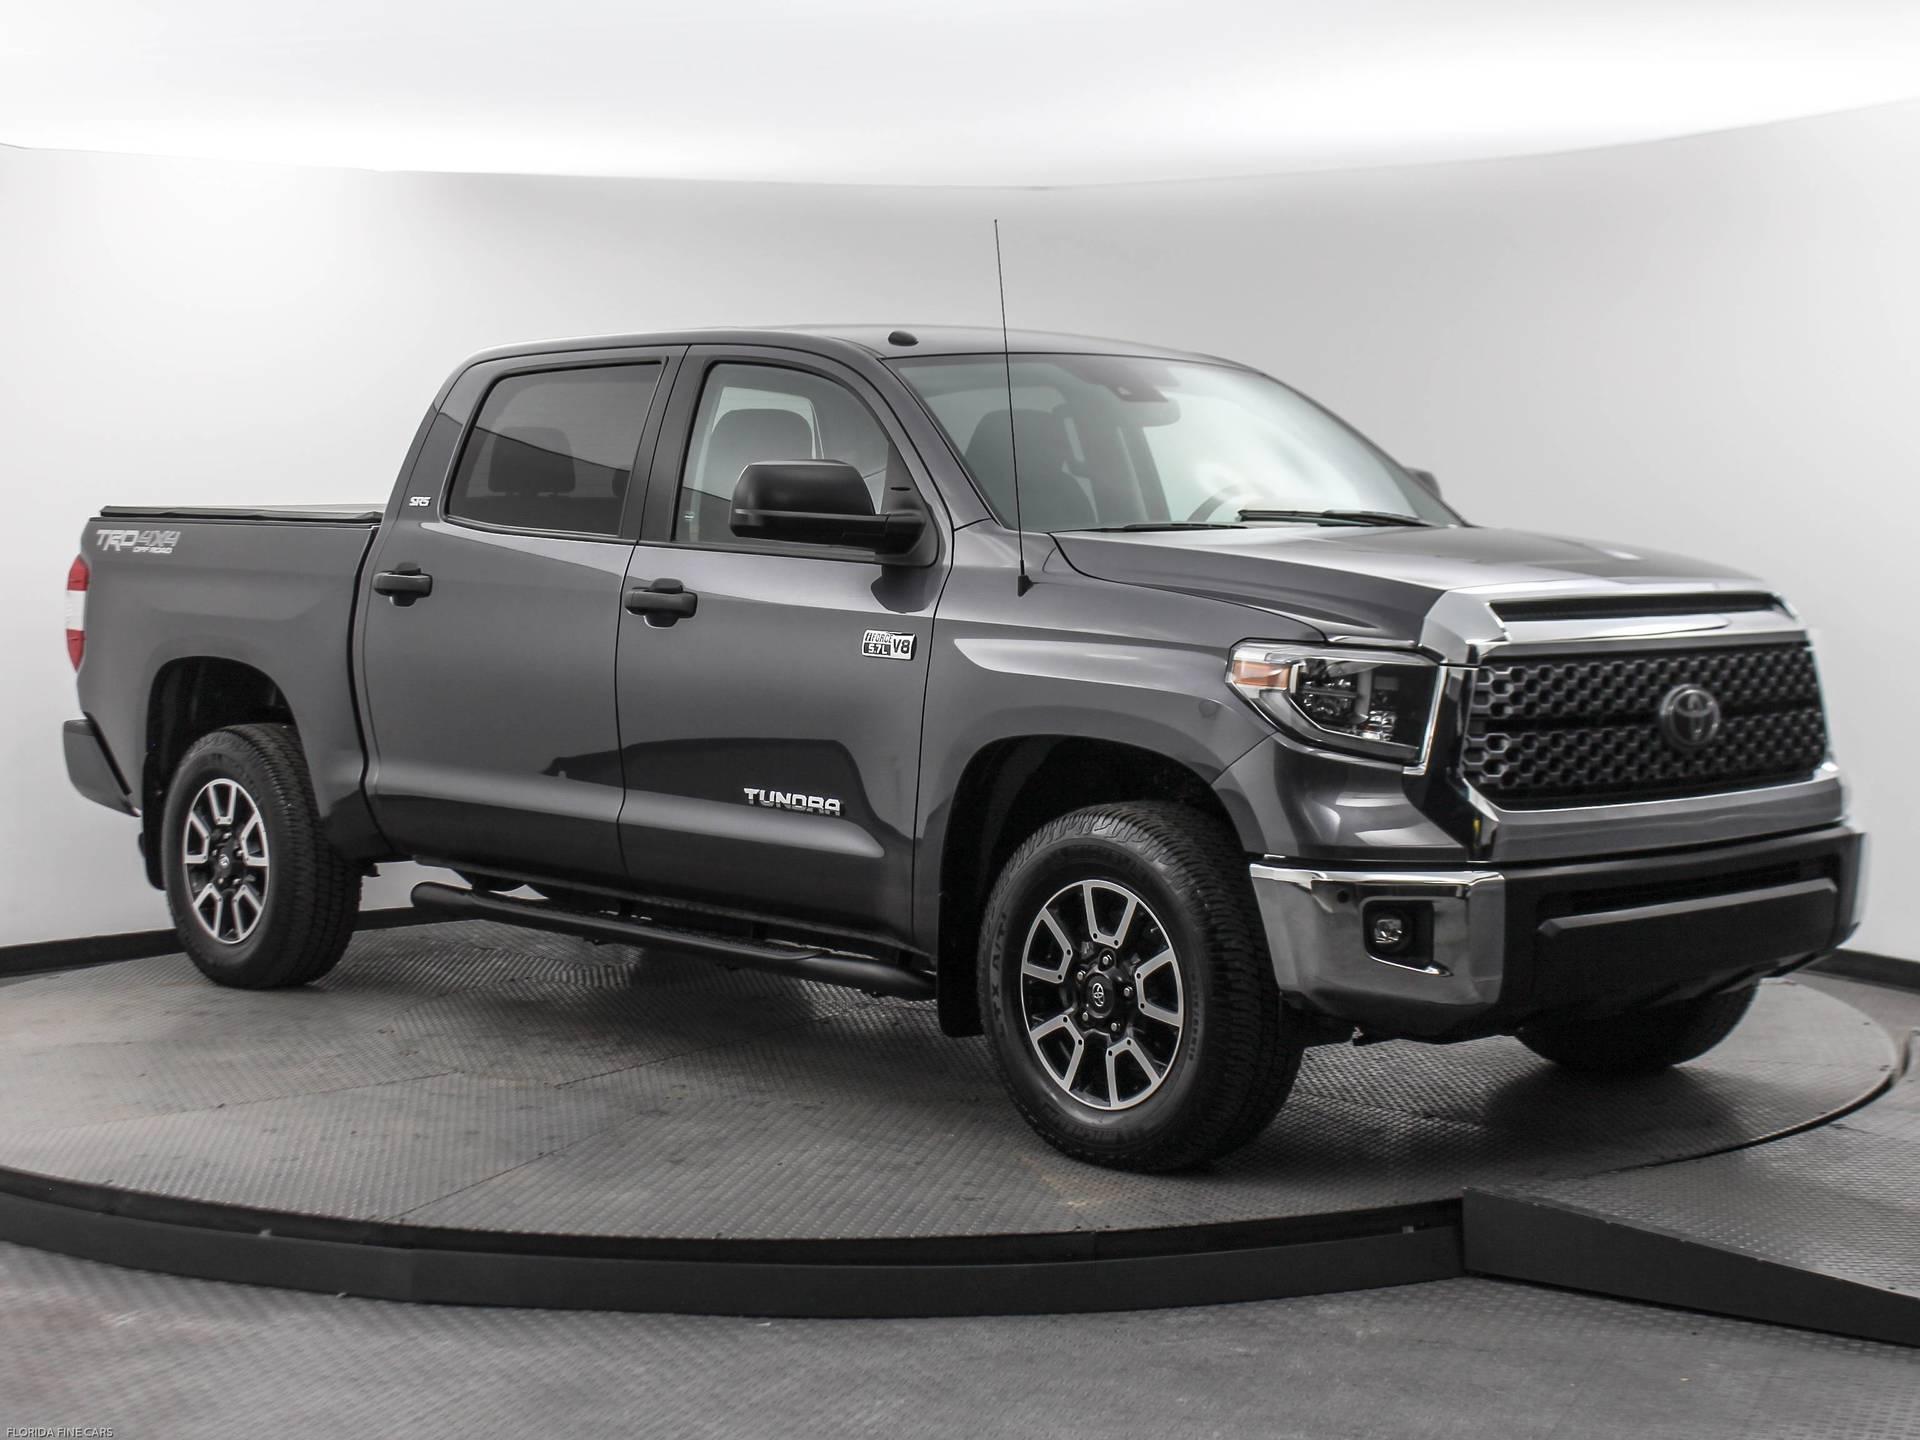 Florida Fine Cars - Used vehicle - Truck TOYOTA TUNDRA 4WD 2018